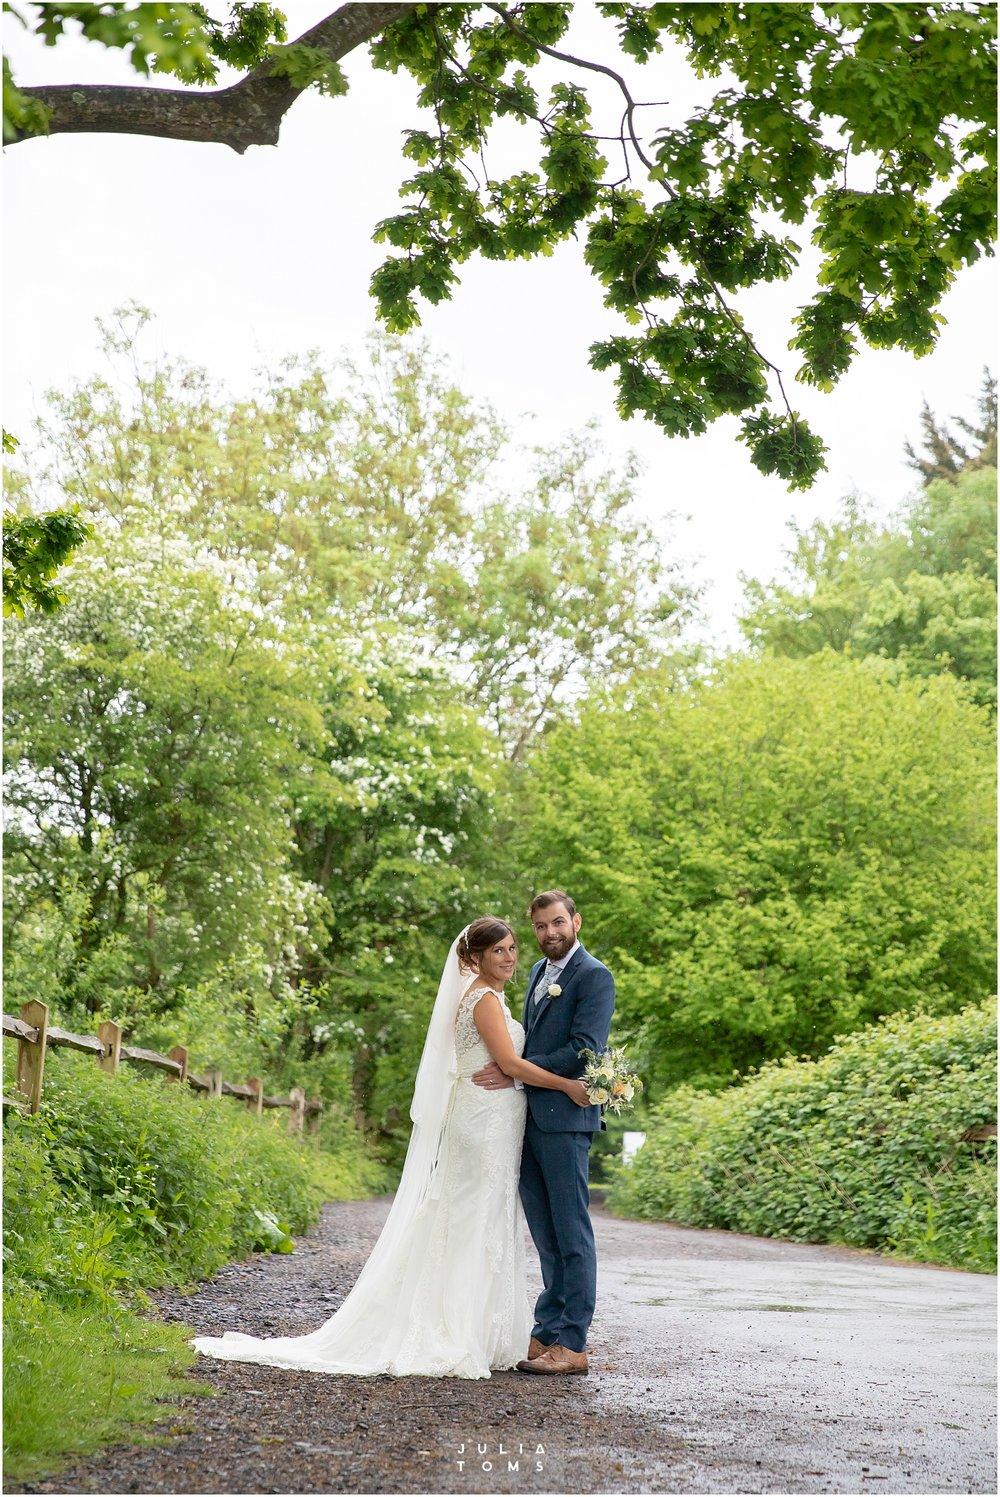 Julia_toms_chichester_wedding_photographer_014.jpg